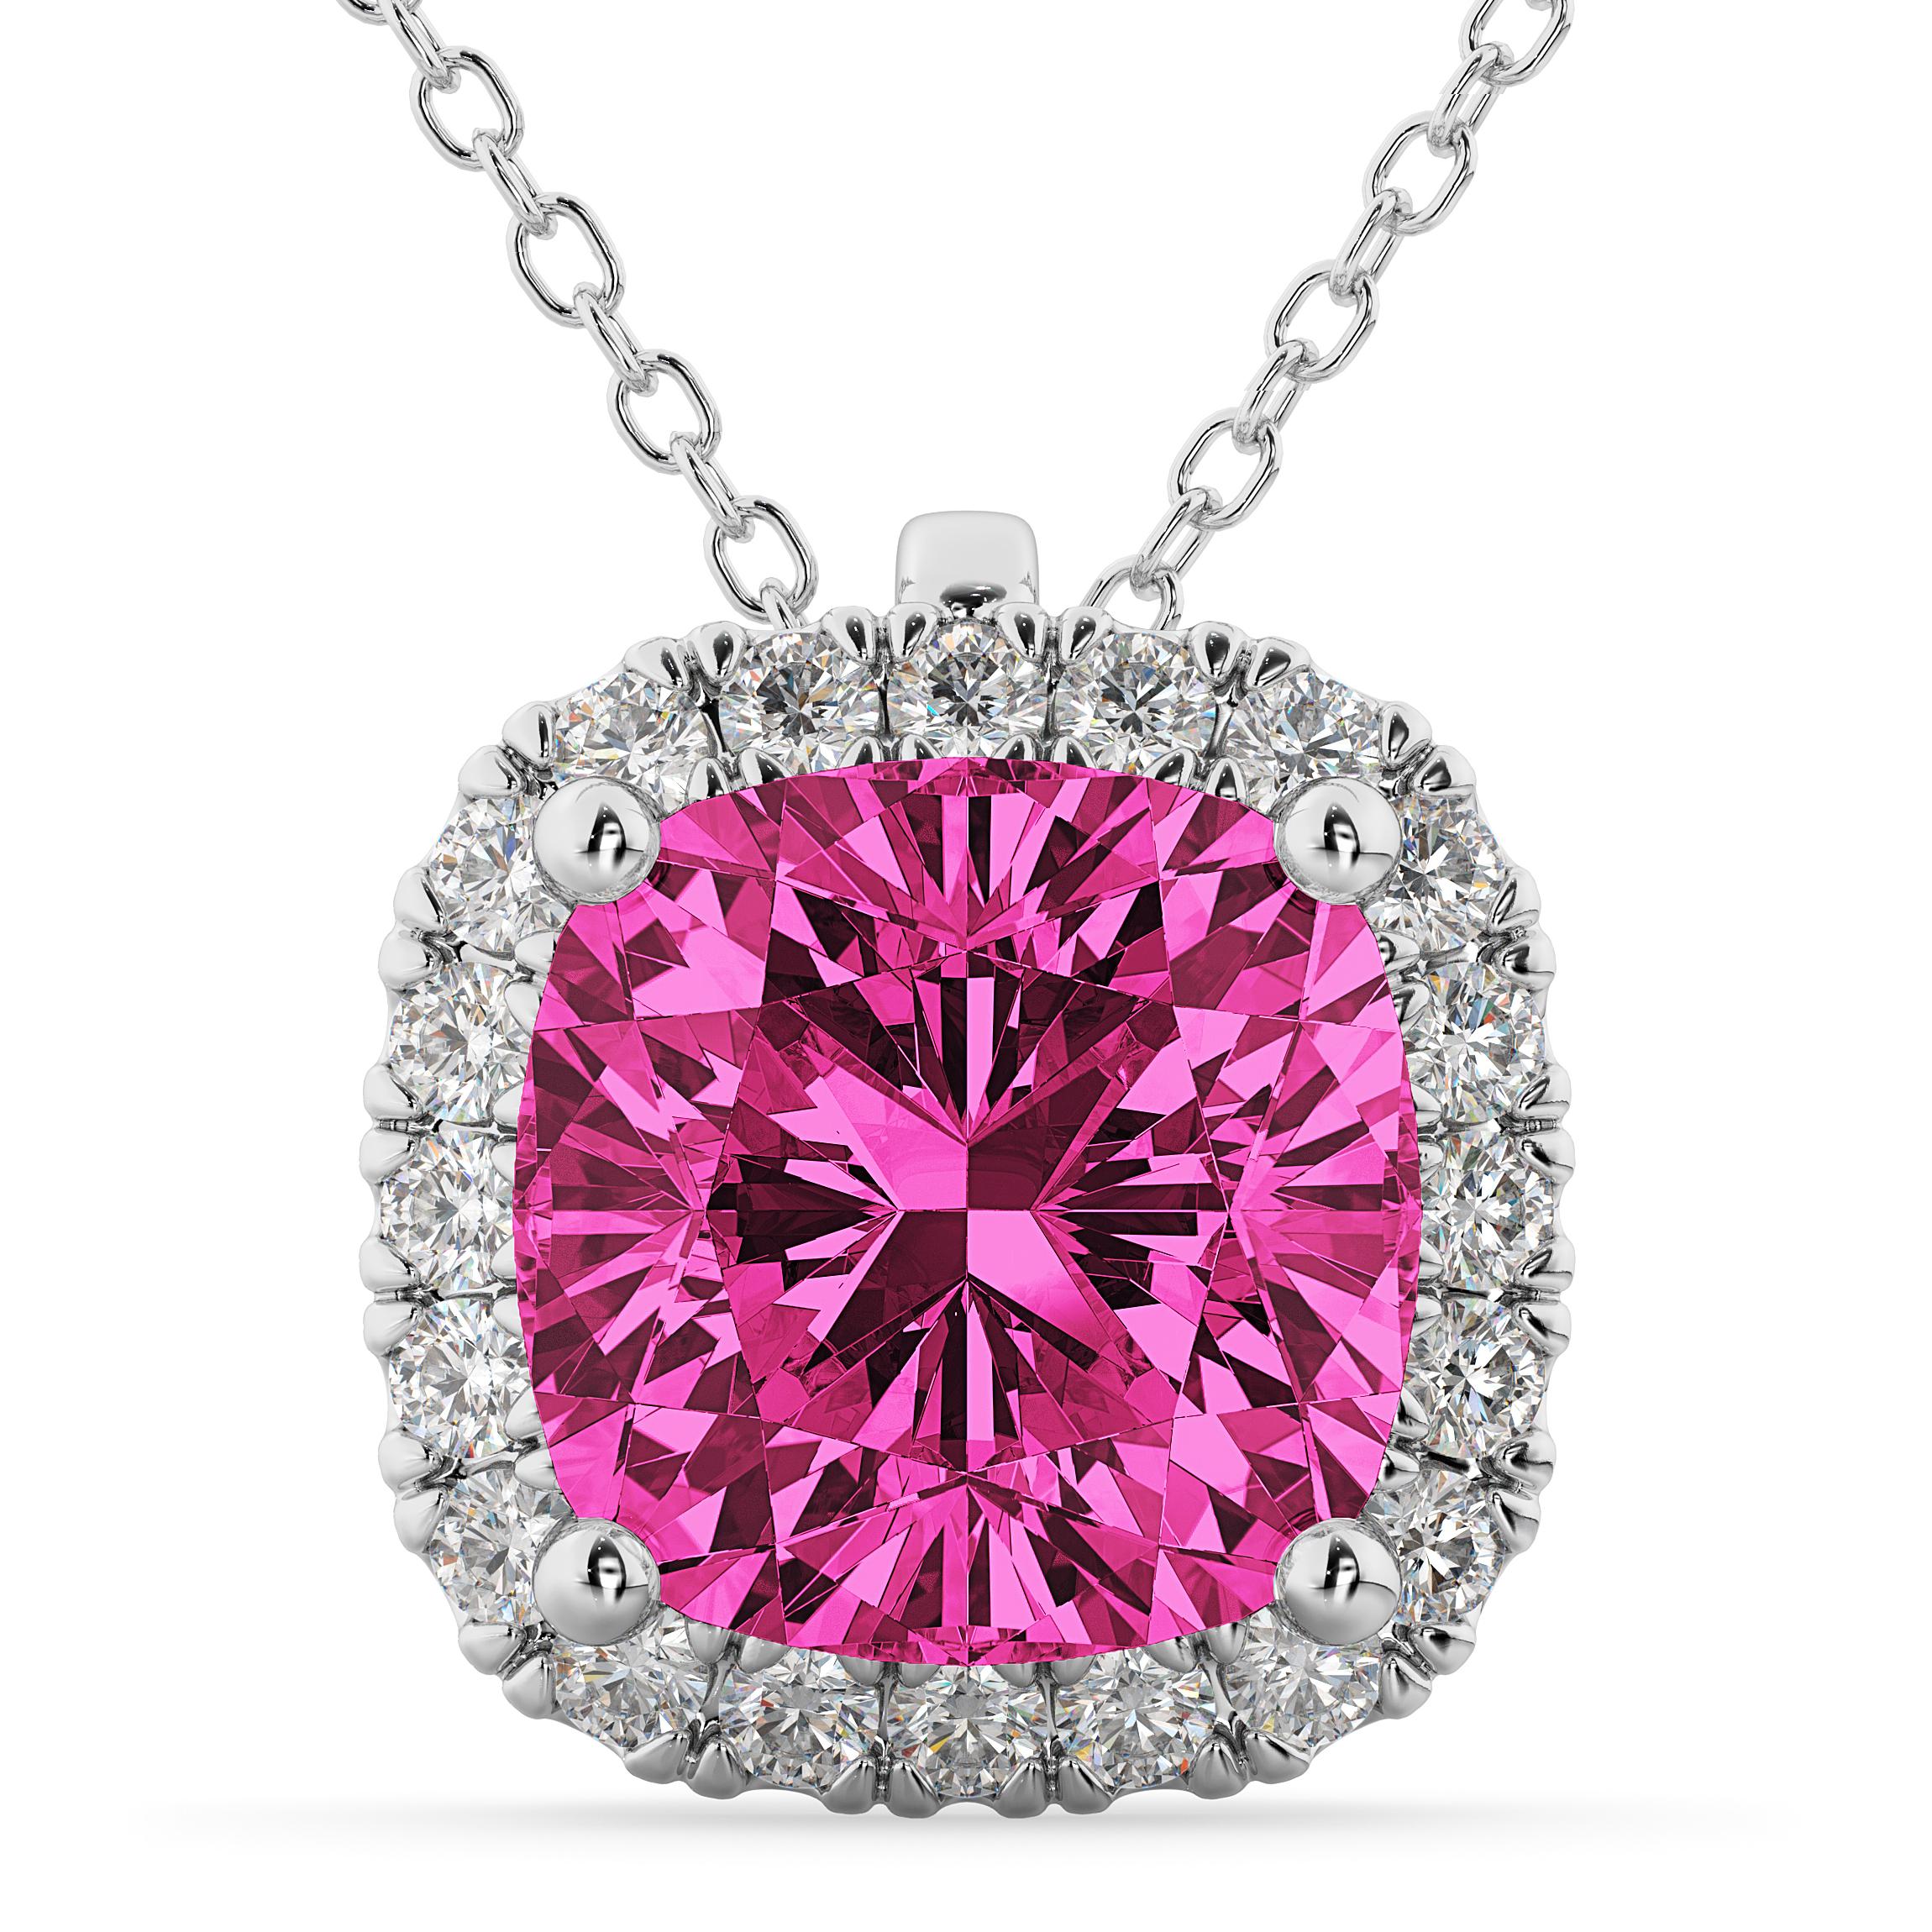 halo pink tourmaline cushion cut pendant necklace 14k. Black Bedroom Furniture Sets. Home Design Ideas